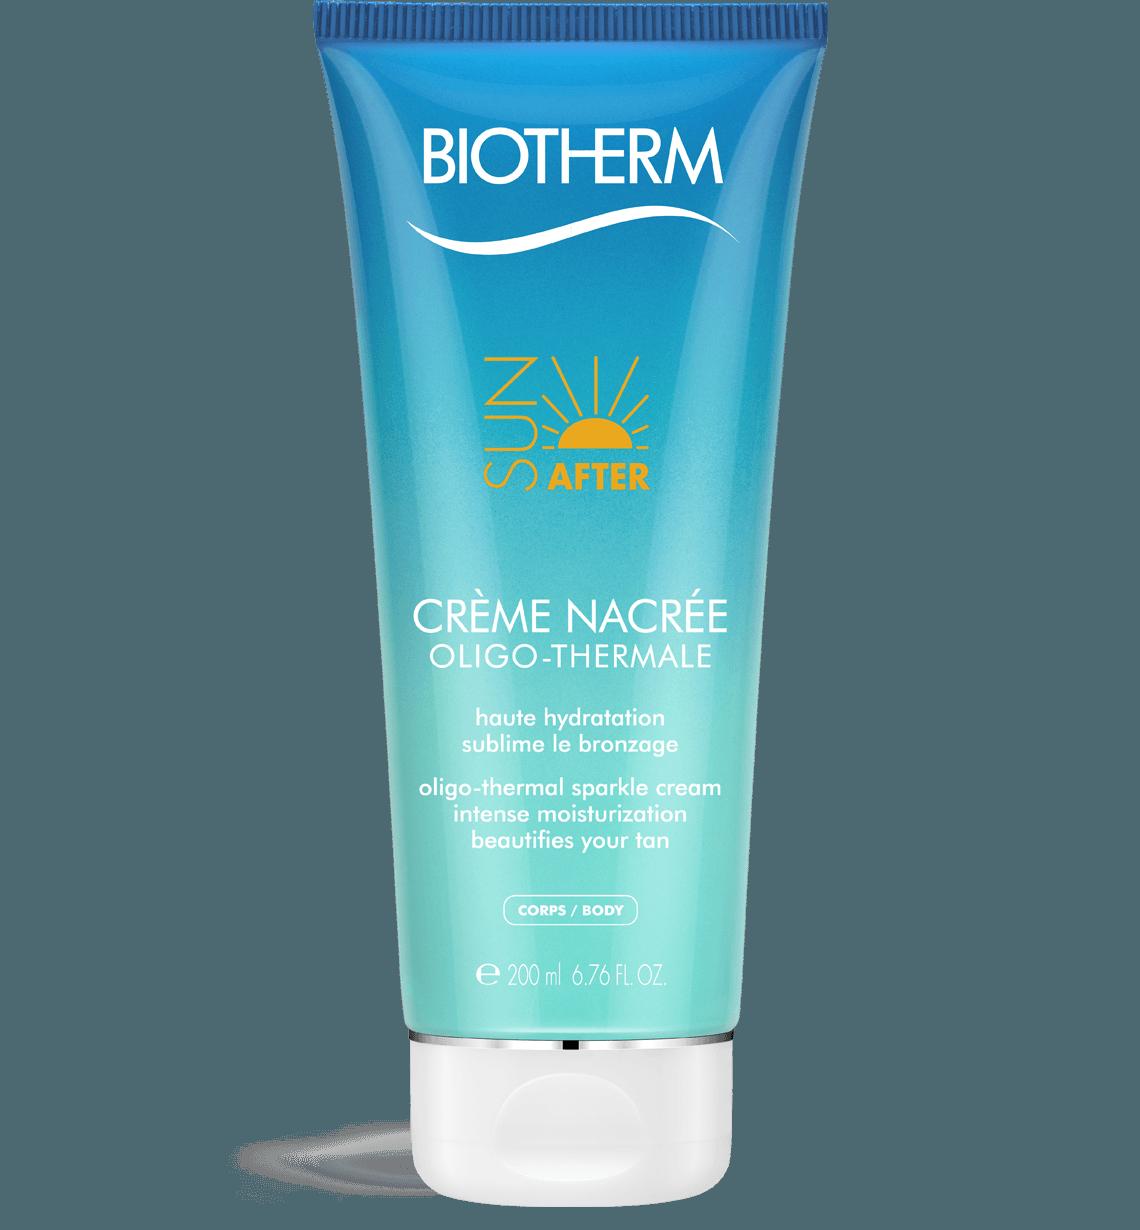 Biotherm - Oligo-Thermale Sparkle Cream Intense Moisturization Beautifies Your Tan -200ml/6.76oz Balance To-Go Started Kit (Normal to Combination Skin): Clay Chameleon+Skinlongevity+Brilliant Futur